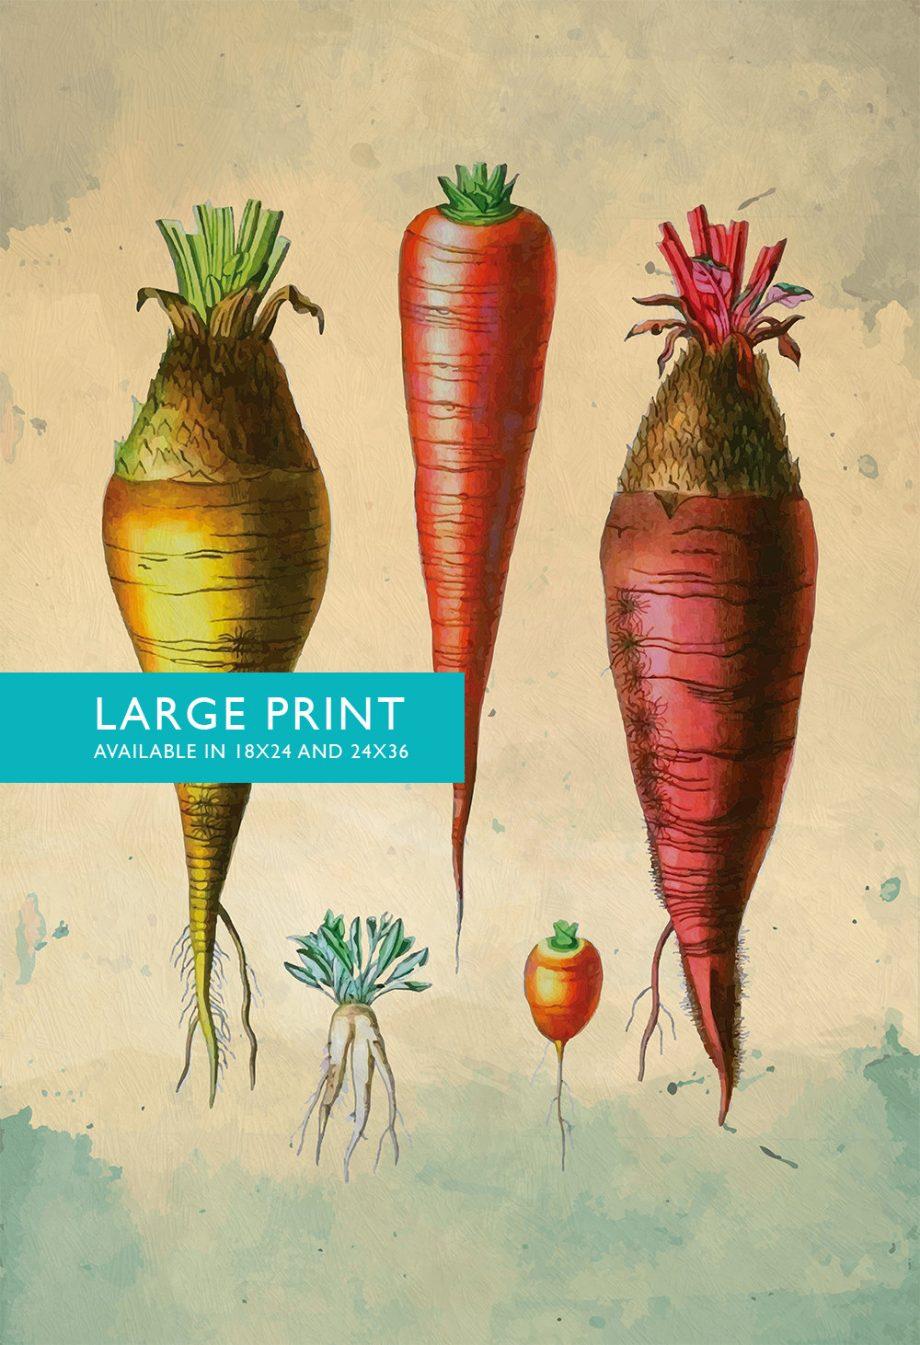 Kitchen Print Kitchen Decor Carrot Varities Art Rustic Farmhouse Giclee Vegan Print Vegetable Print on Cotton Canvas and Satin Photo Paper